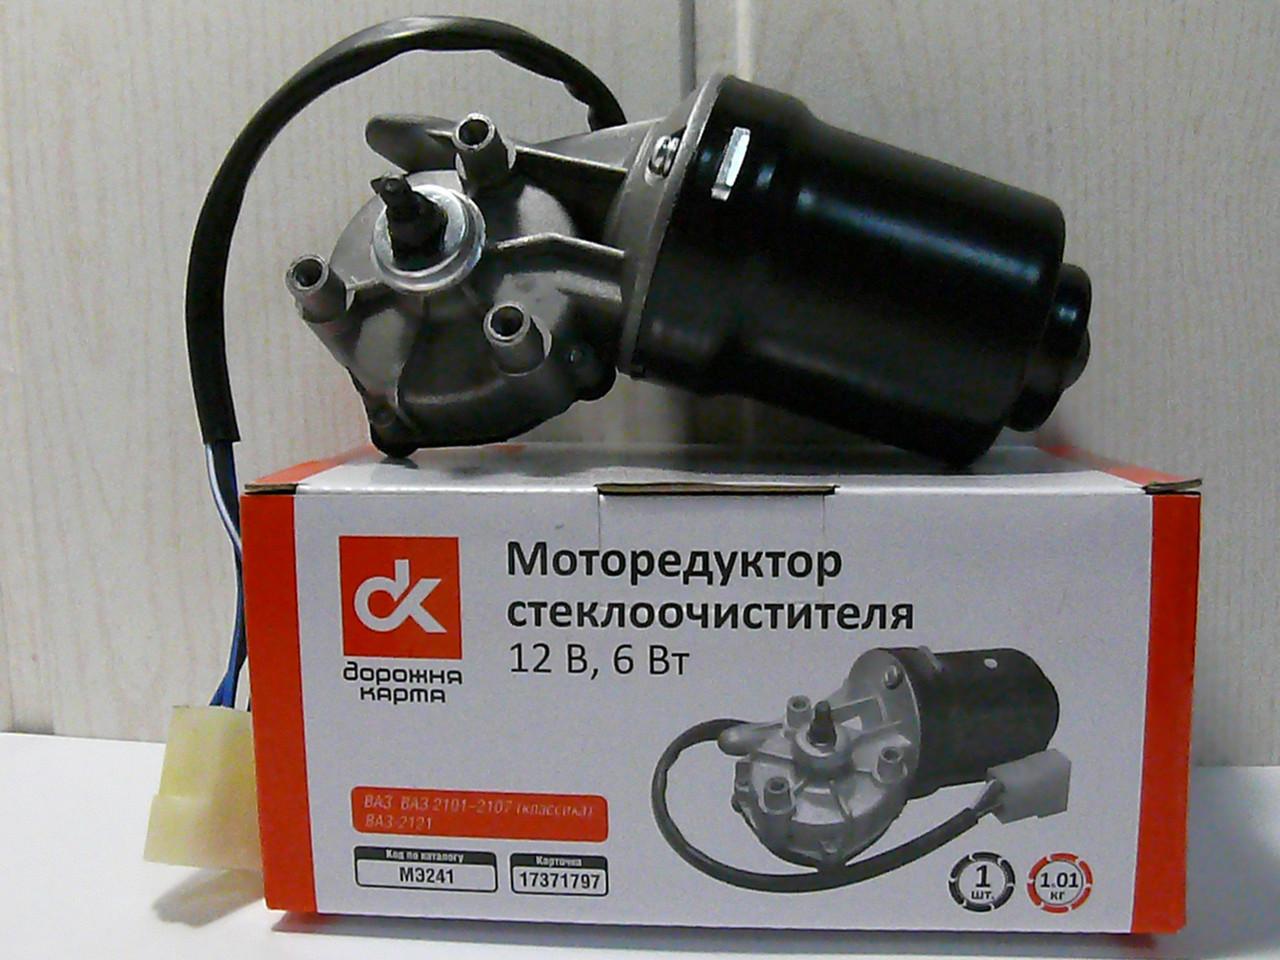 Моторедуктор стеклоочистителя ВАЗ 2101-07, 2121 12В 6Вт